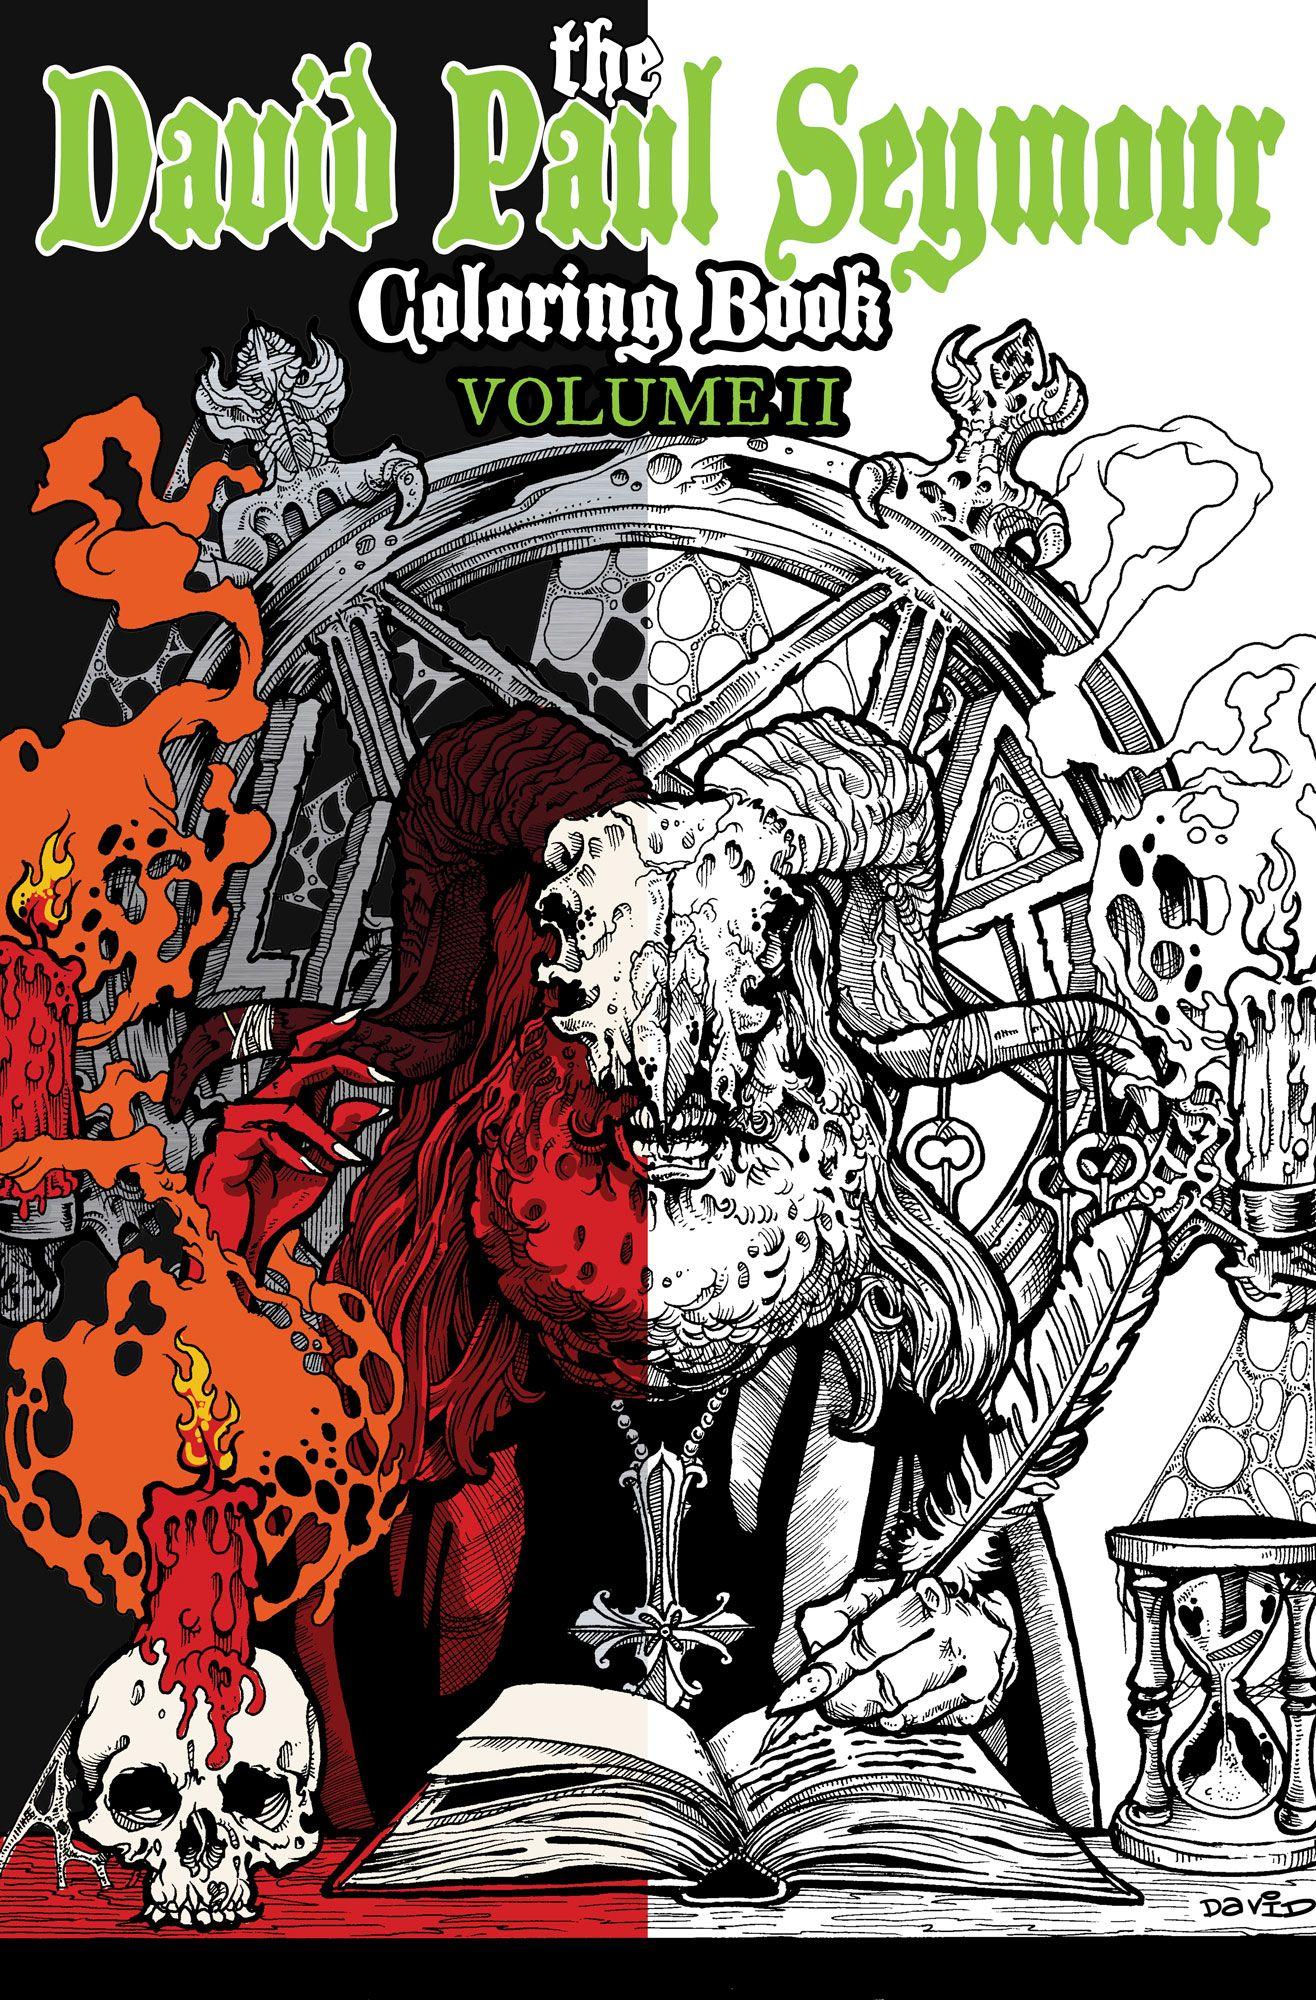 David Paul Seymour Heavy Metal Adult Coloring Book VOLUME II from